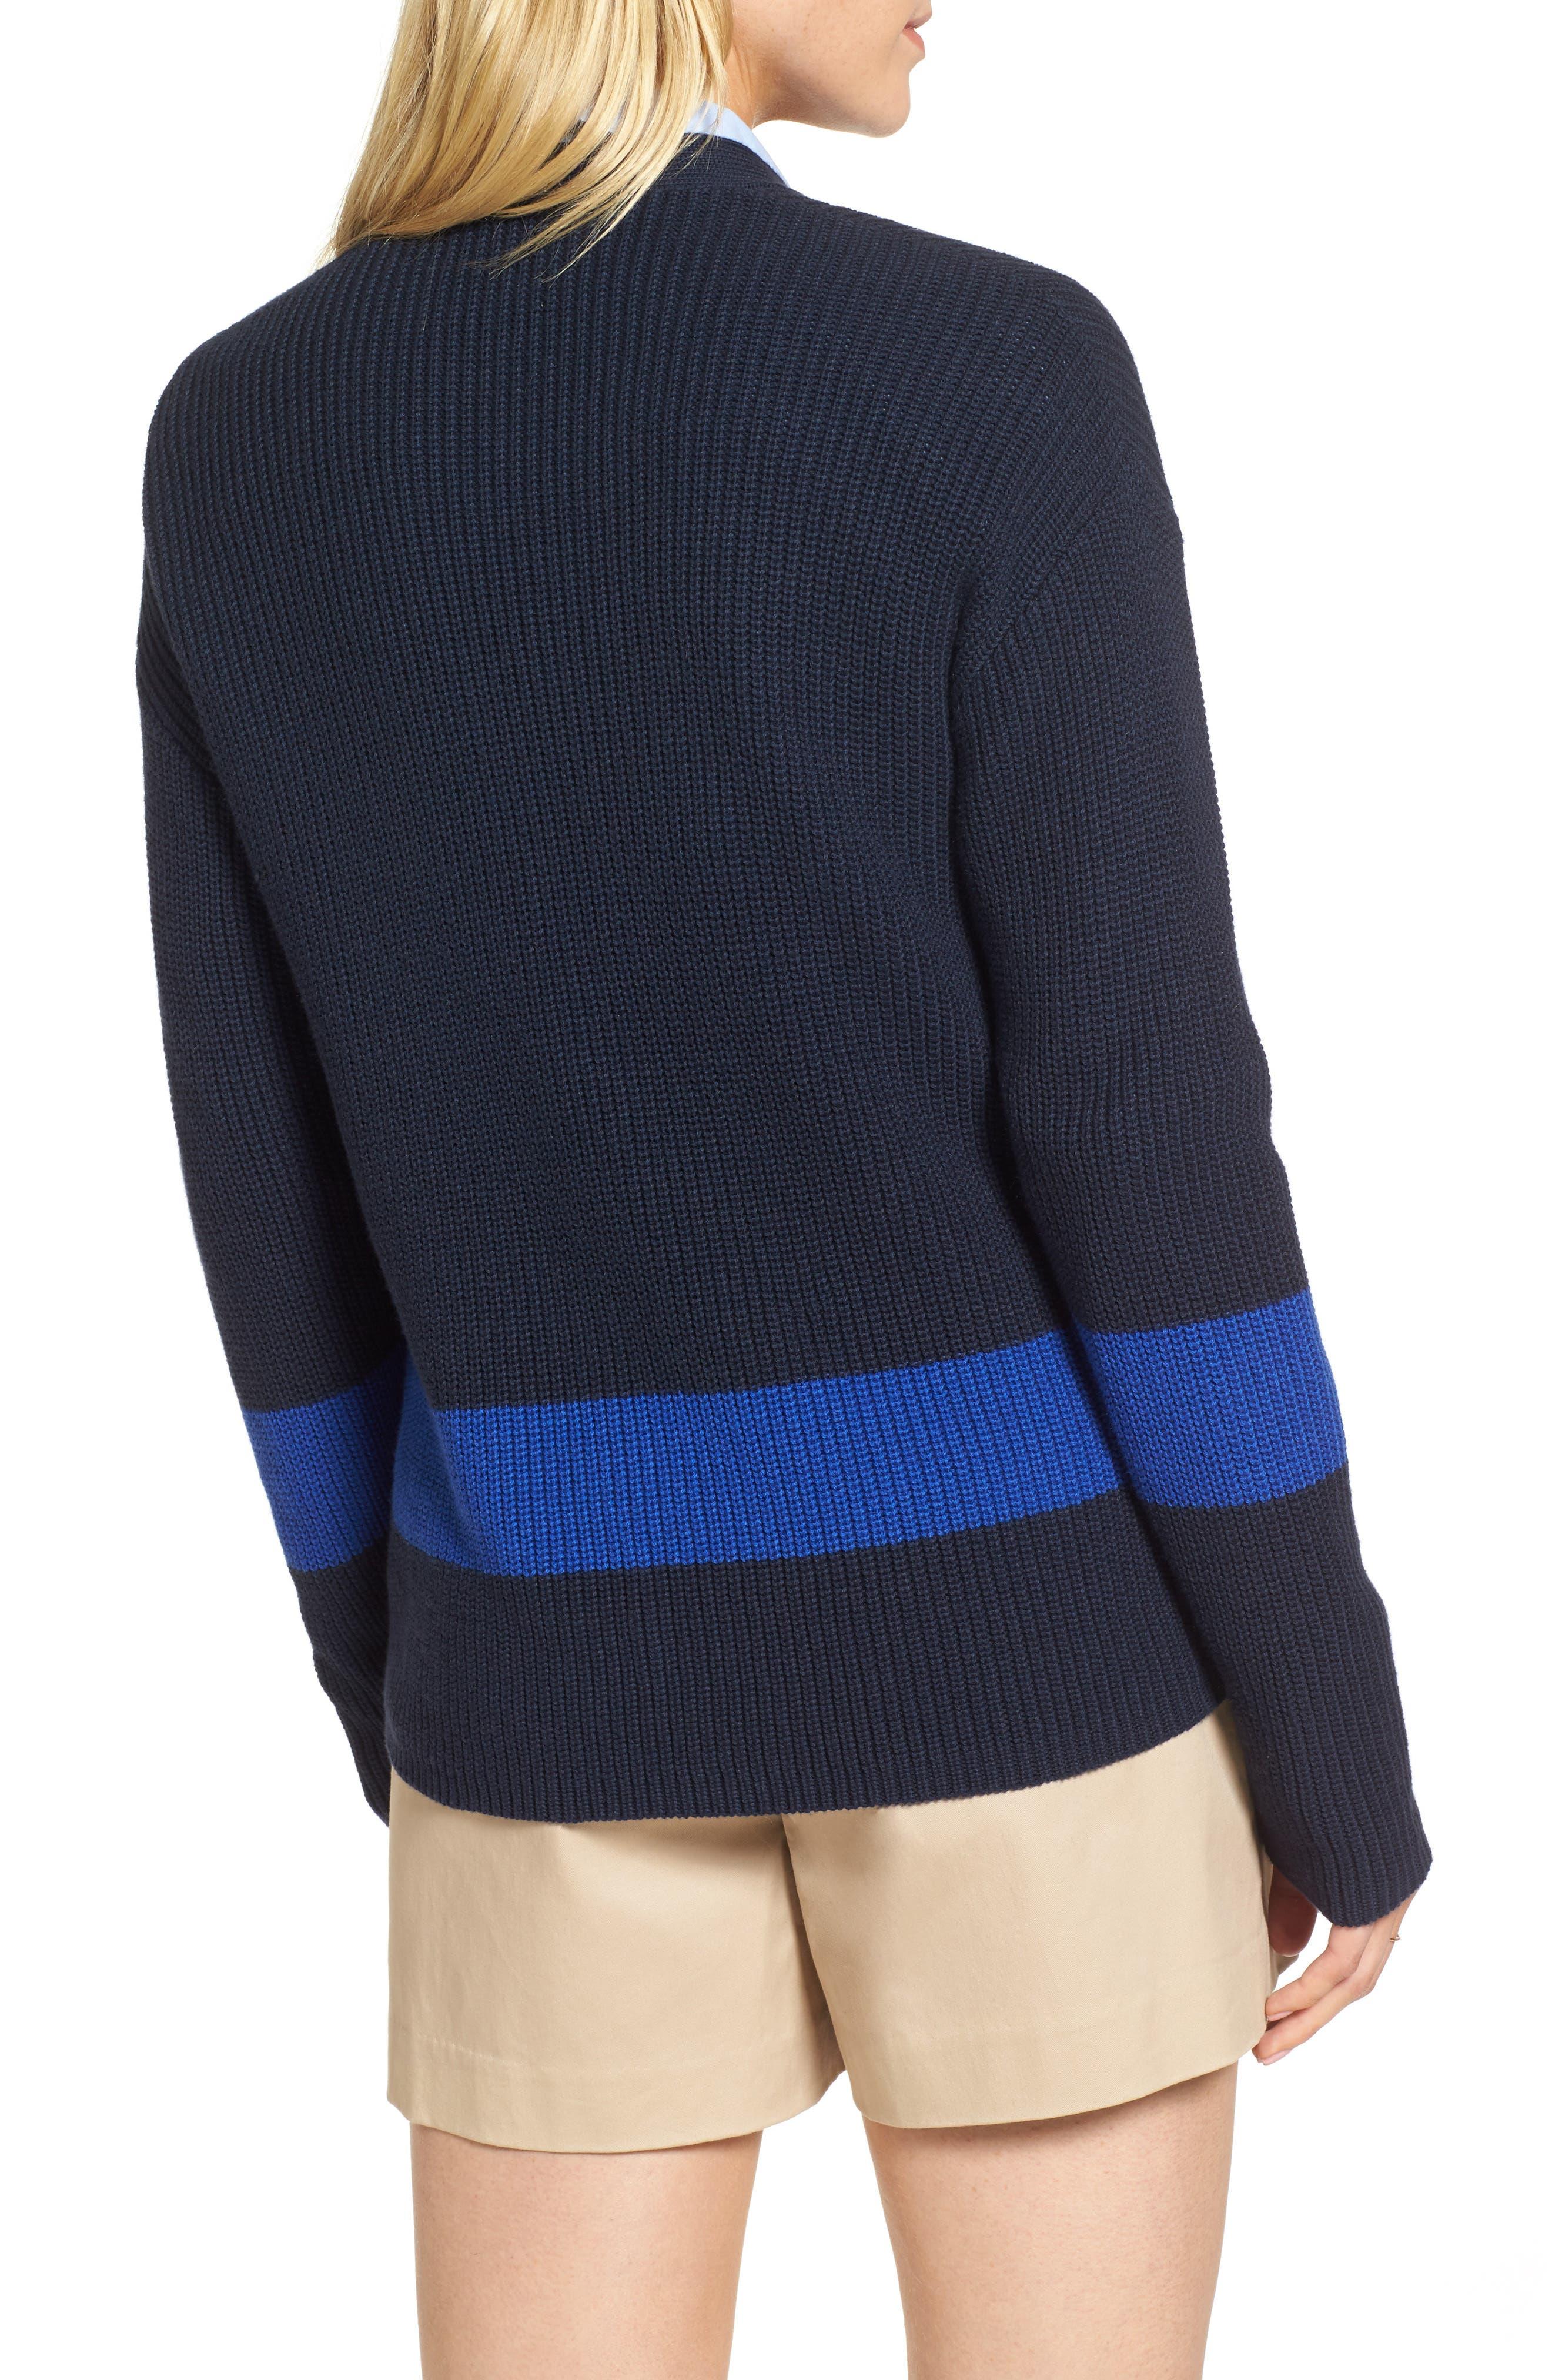 Shaker Knit Cardigan,                             Alternate thumbnail 2, color,                             Navy- Blue Colorblock